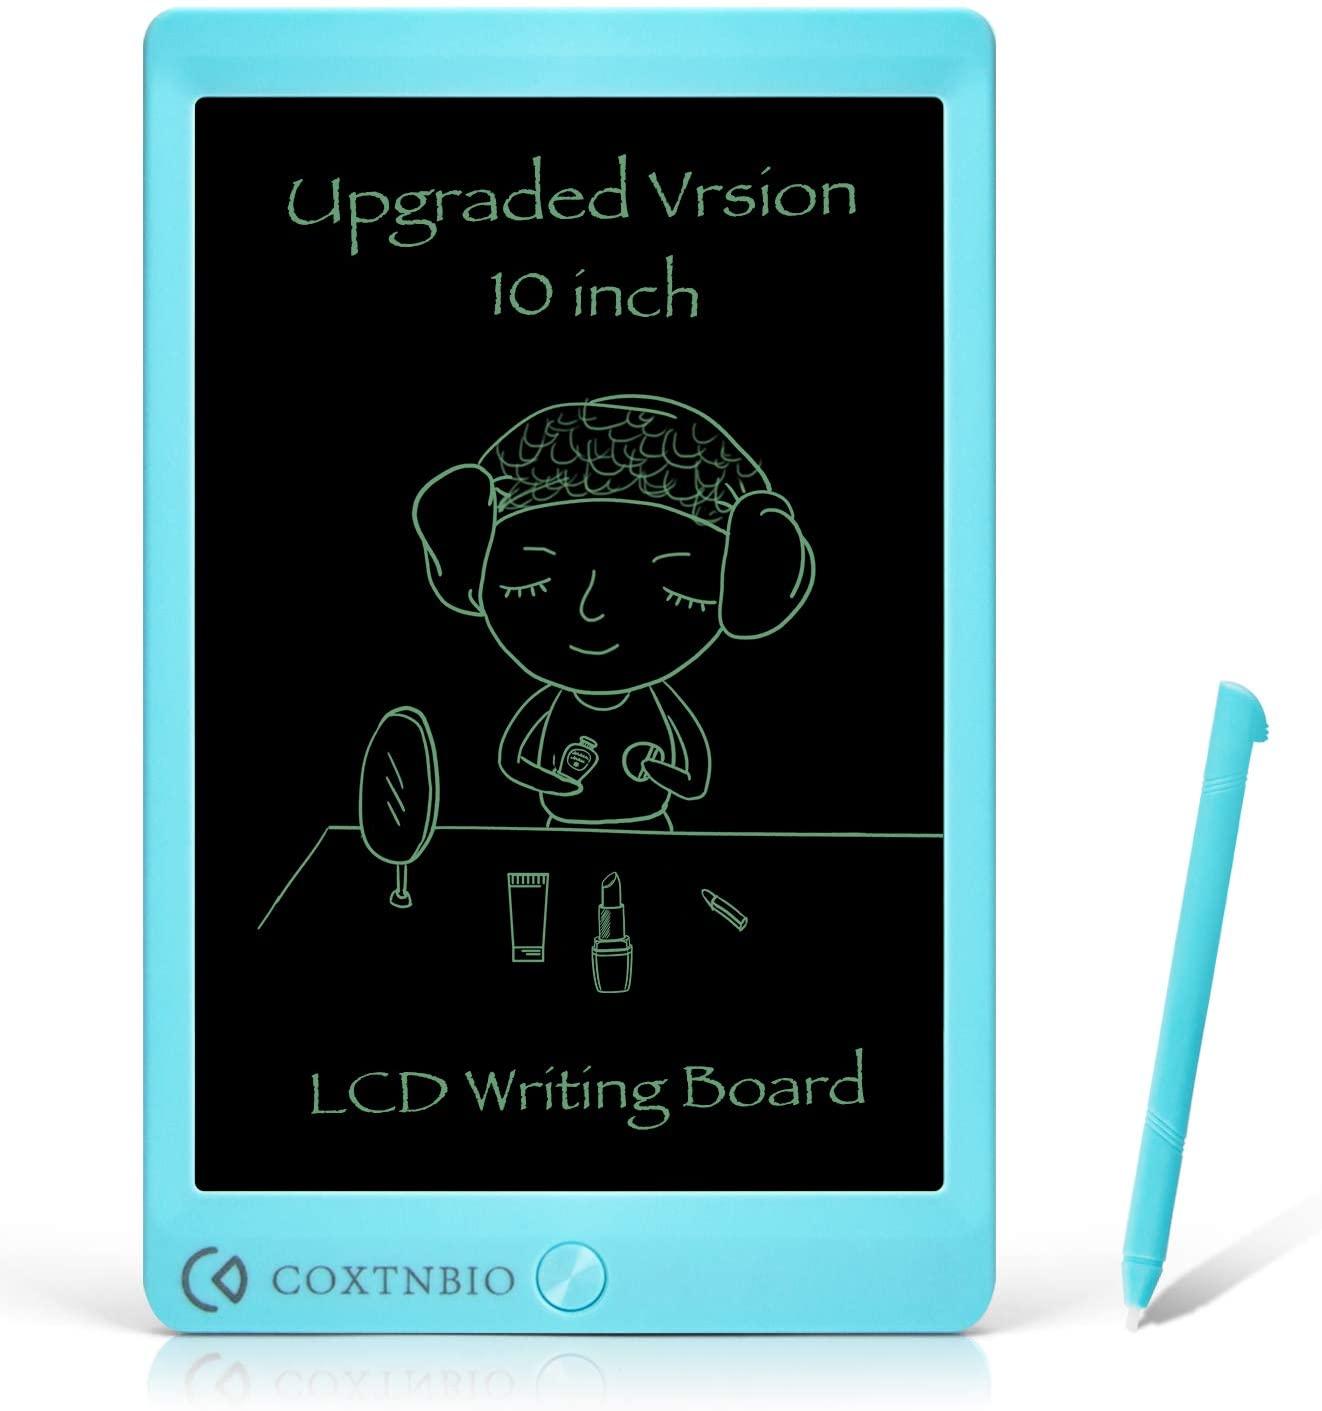 Coxtnbio 10 inch LCD Writing Tablet, Drawing Board for Kids Drawing Tablet Writing Pads Harmless to Eyes Birthday Gift Office Blackboard (Blue)